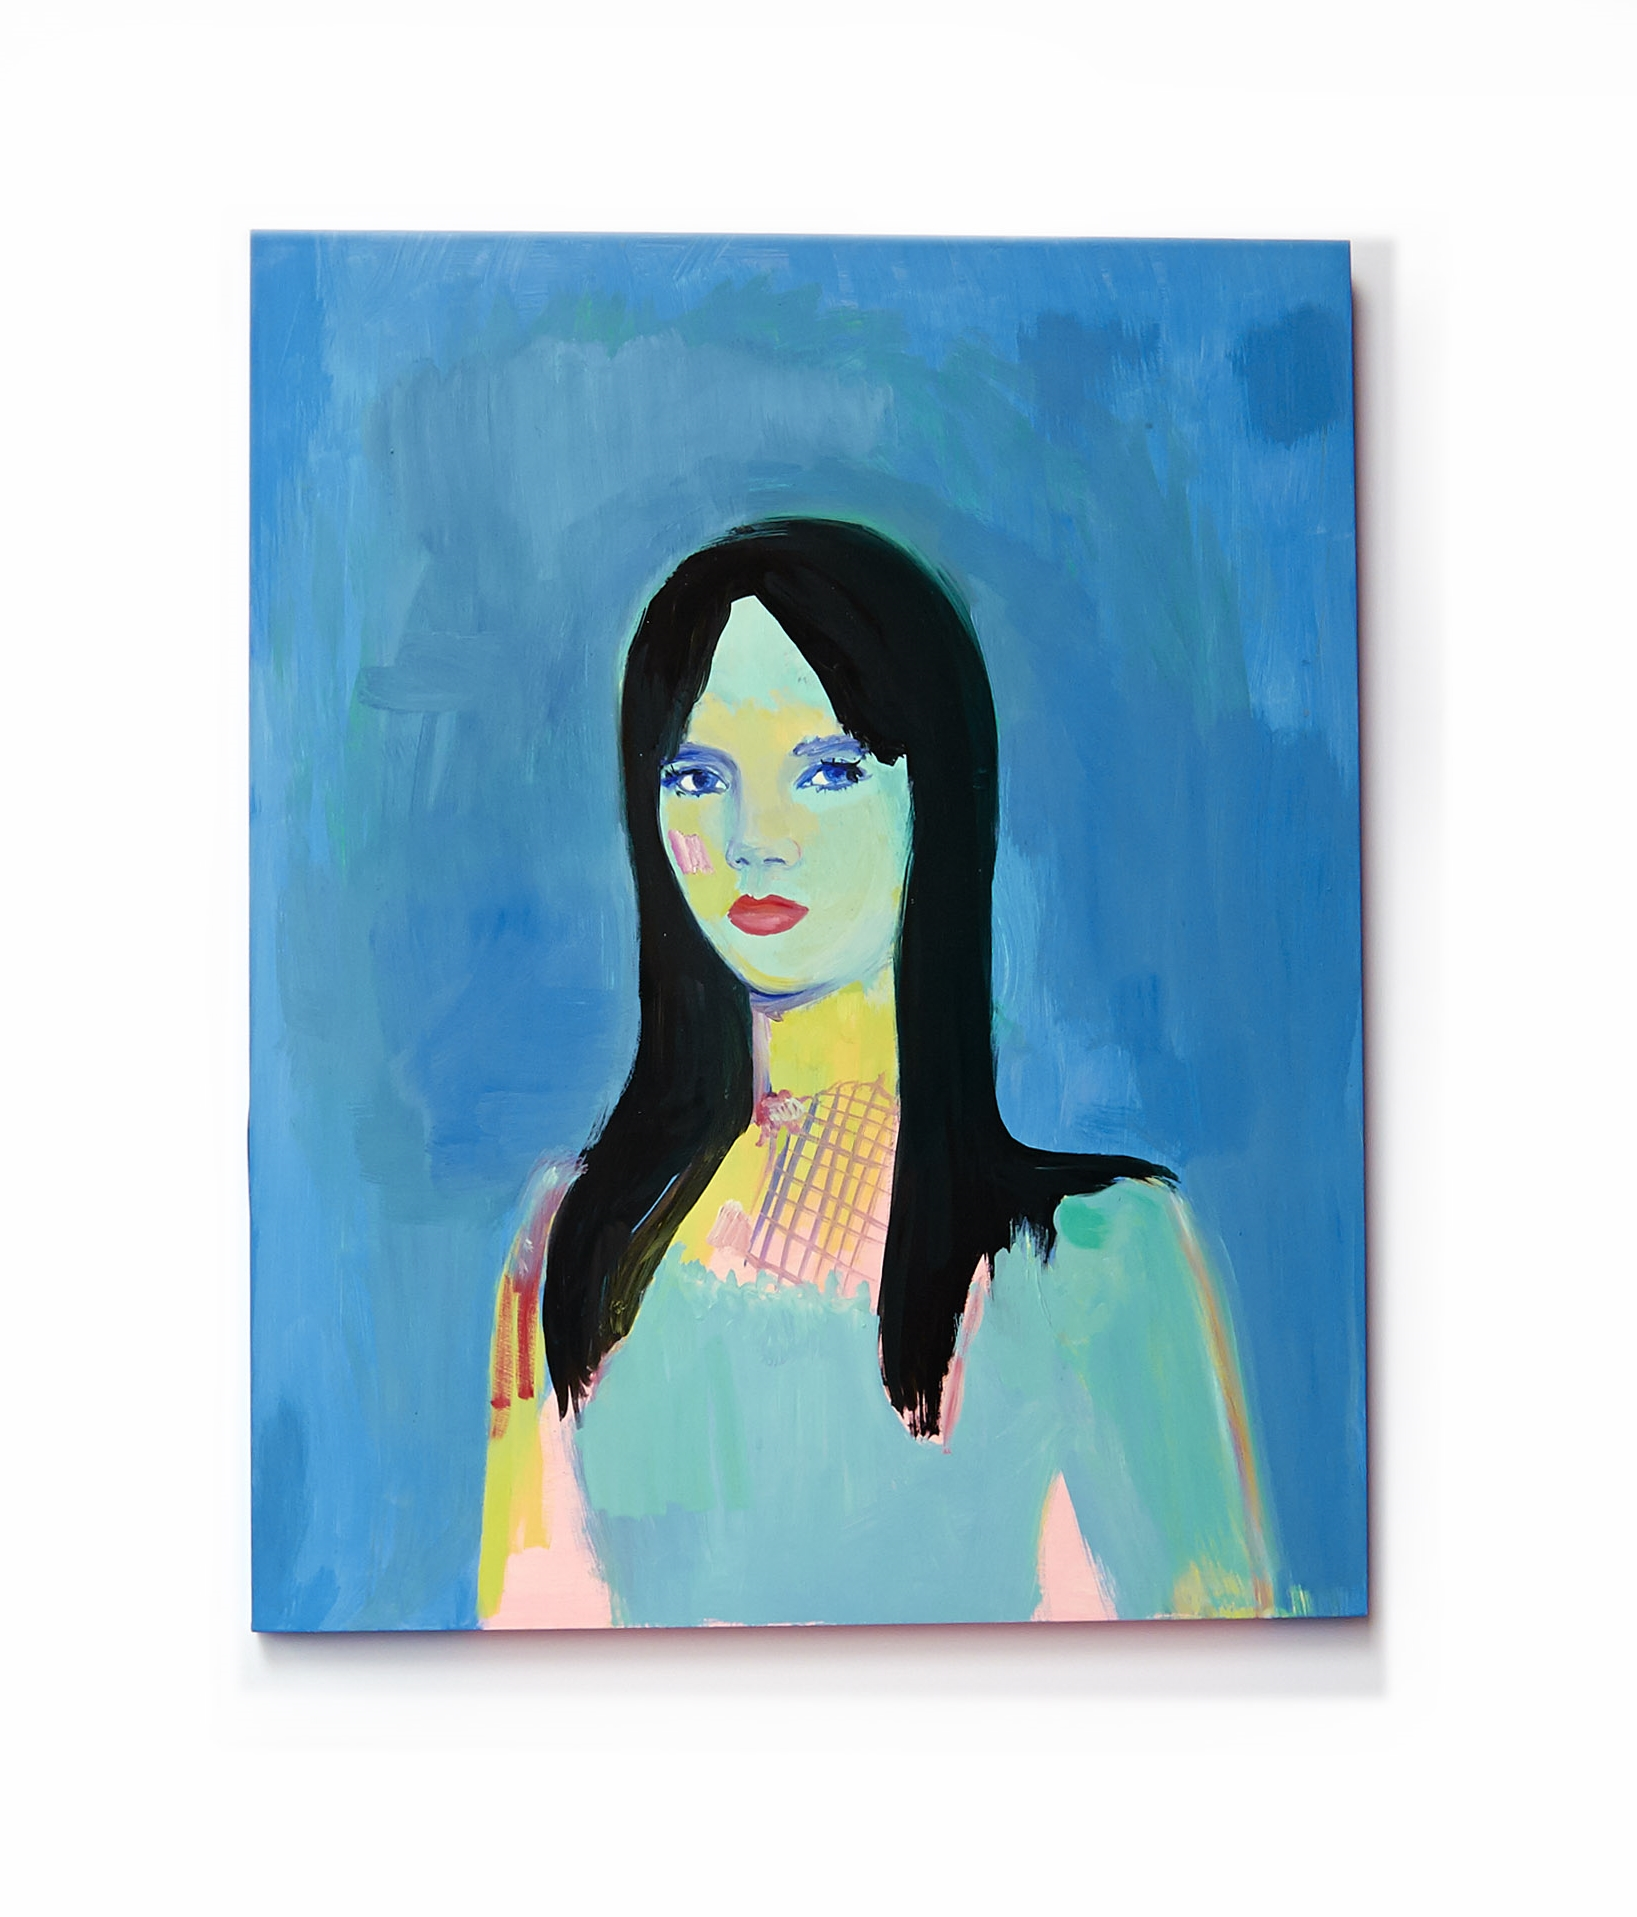 Bliss, oil on wood, 16 x  20 inches,  2012 © Pilita Garcia